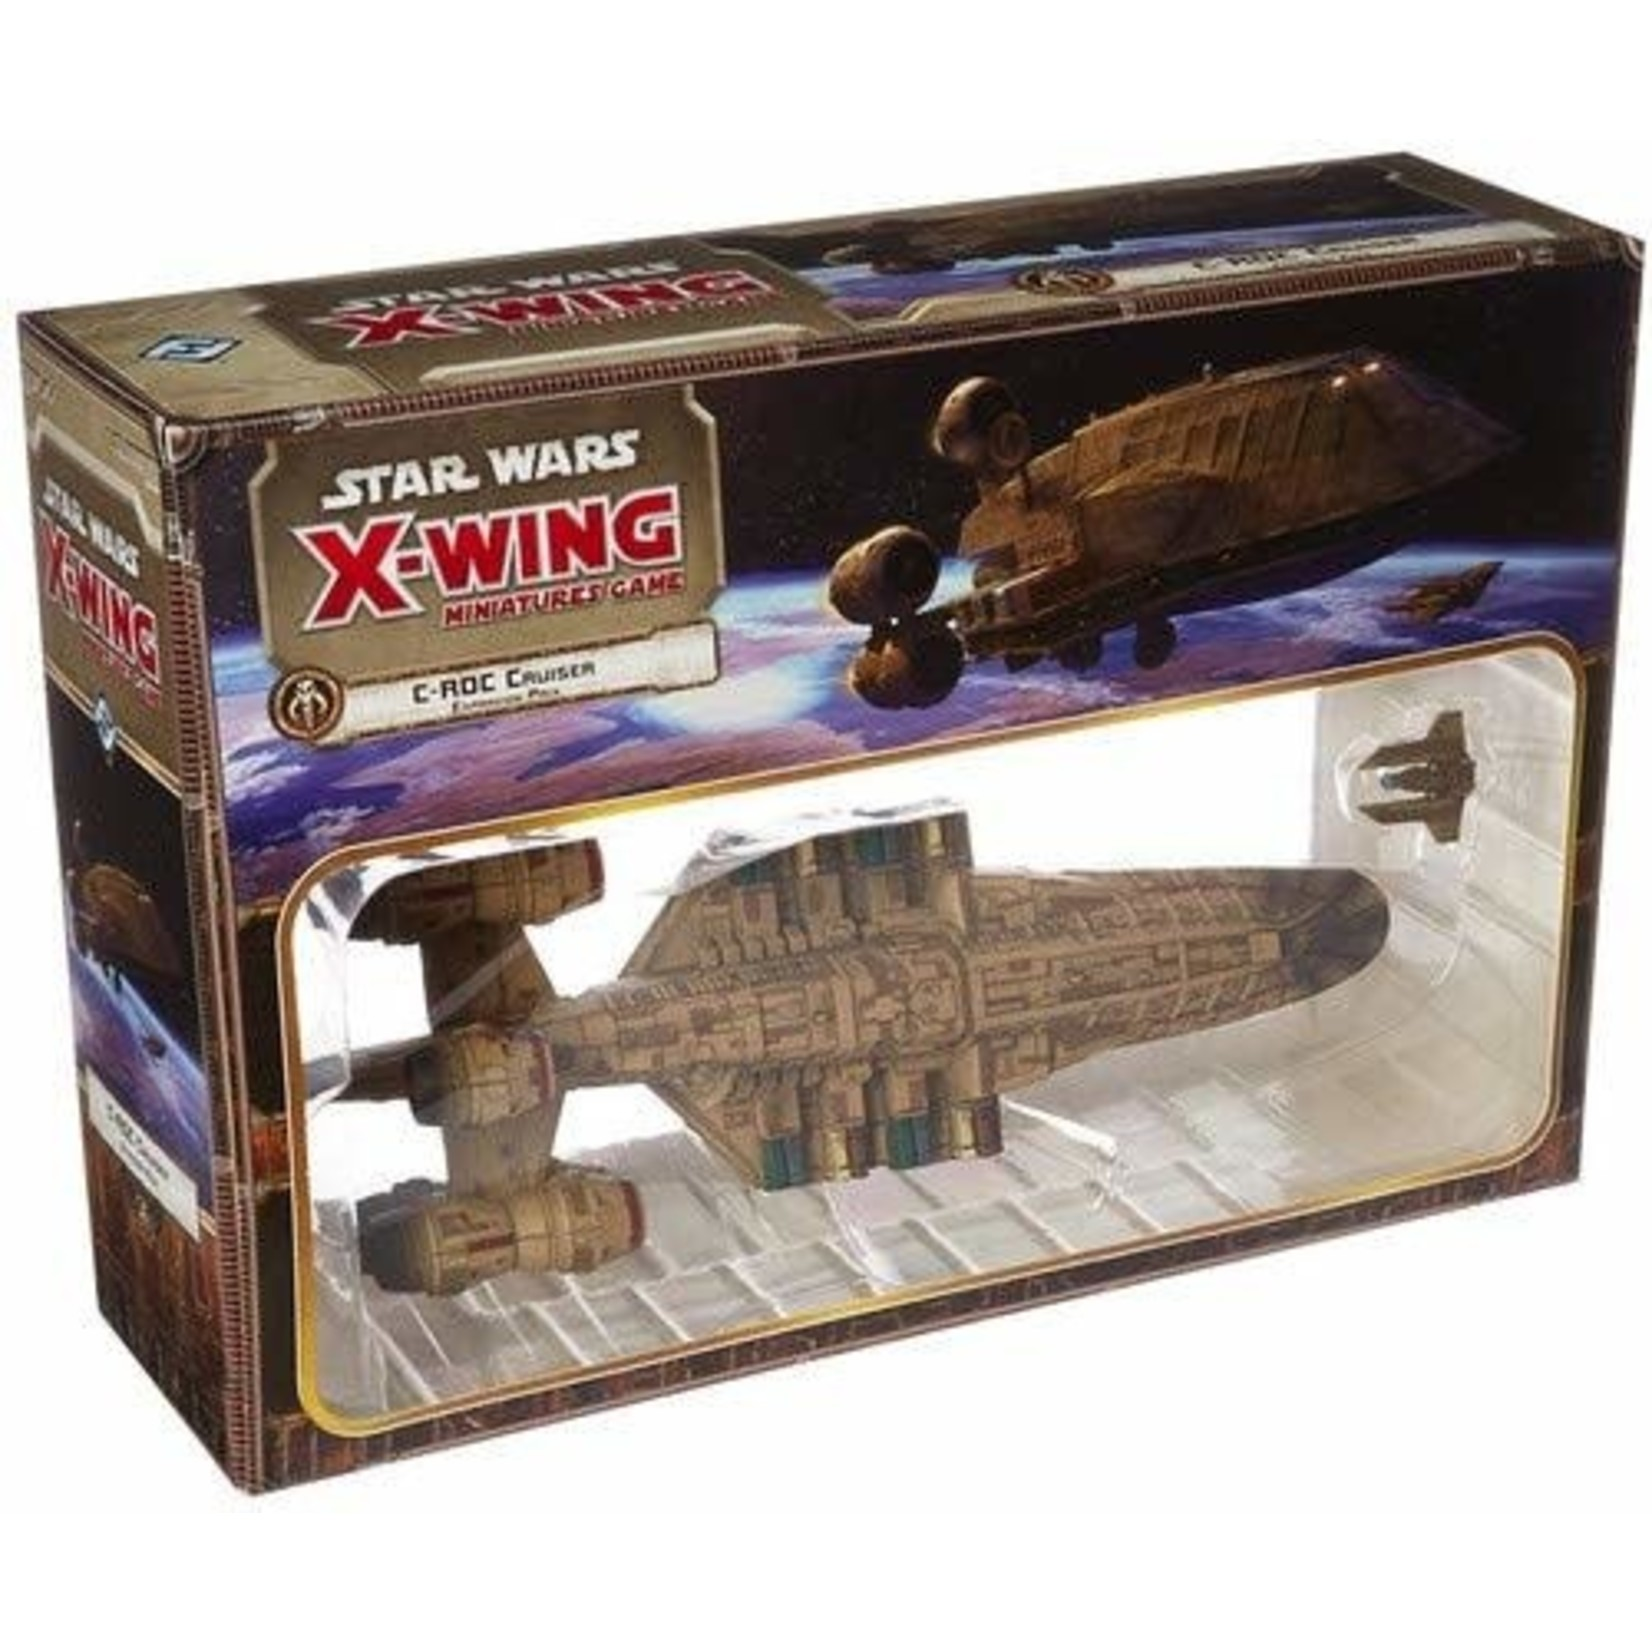 Fantasy Flight Games Star Wars X-Wing 1st Edition: C-ROC Cruiser Expansion Pack